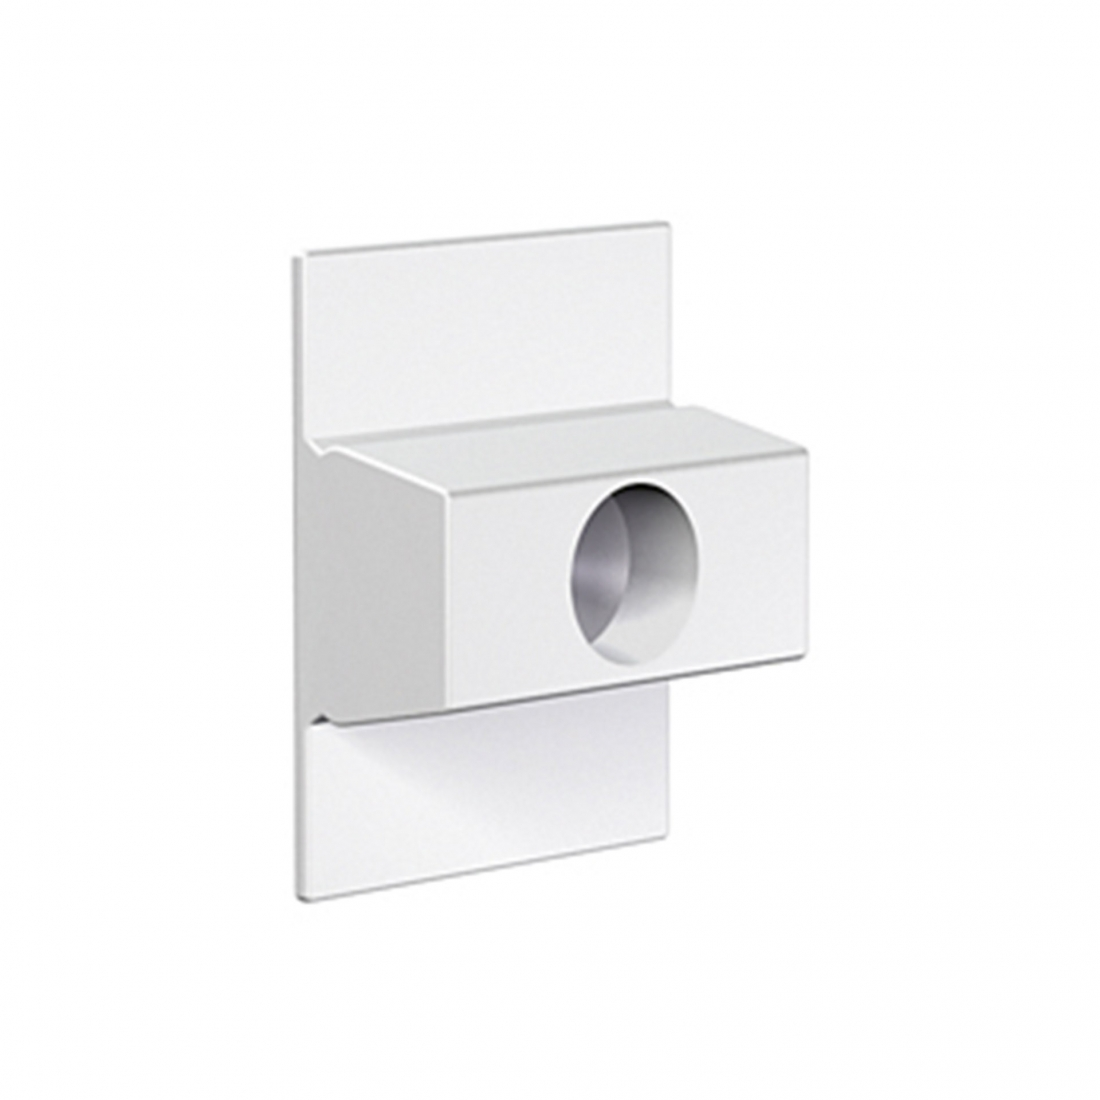 conector de pared para tira de perfil riel guia para colgar cuadros sin hacer agujeros, de artiteq click rail 30 kg